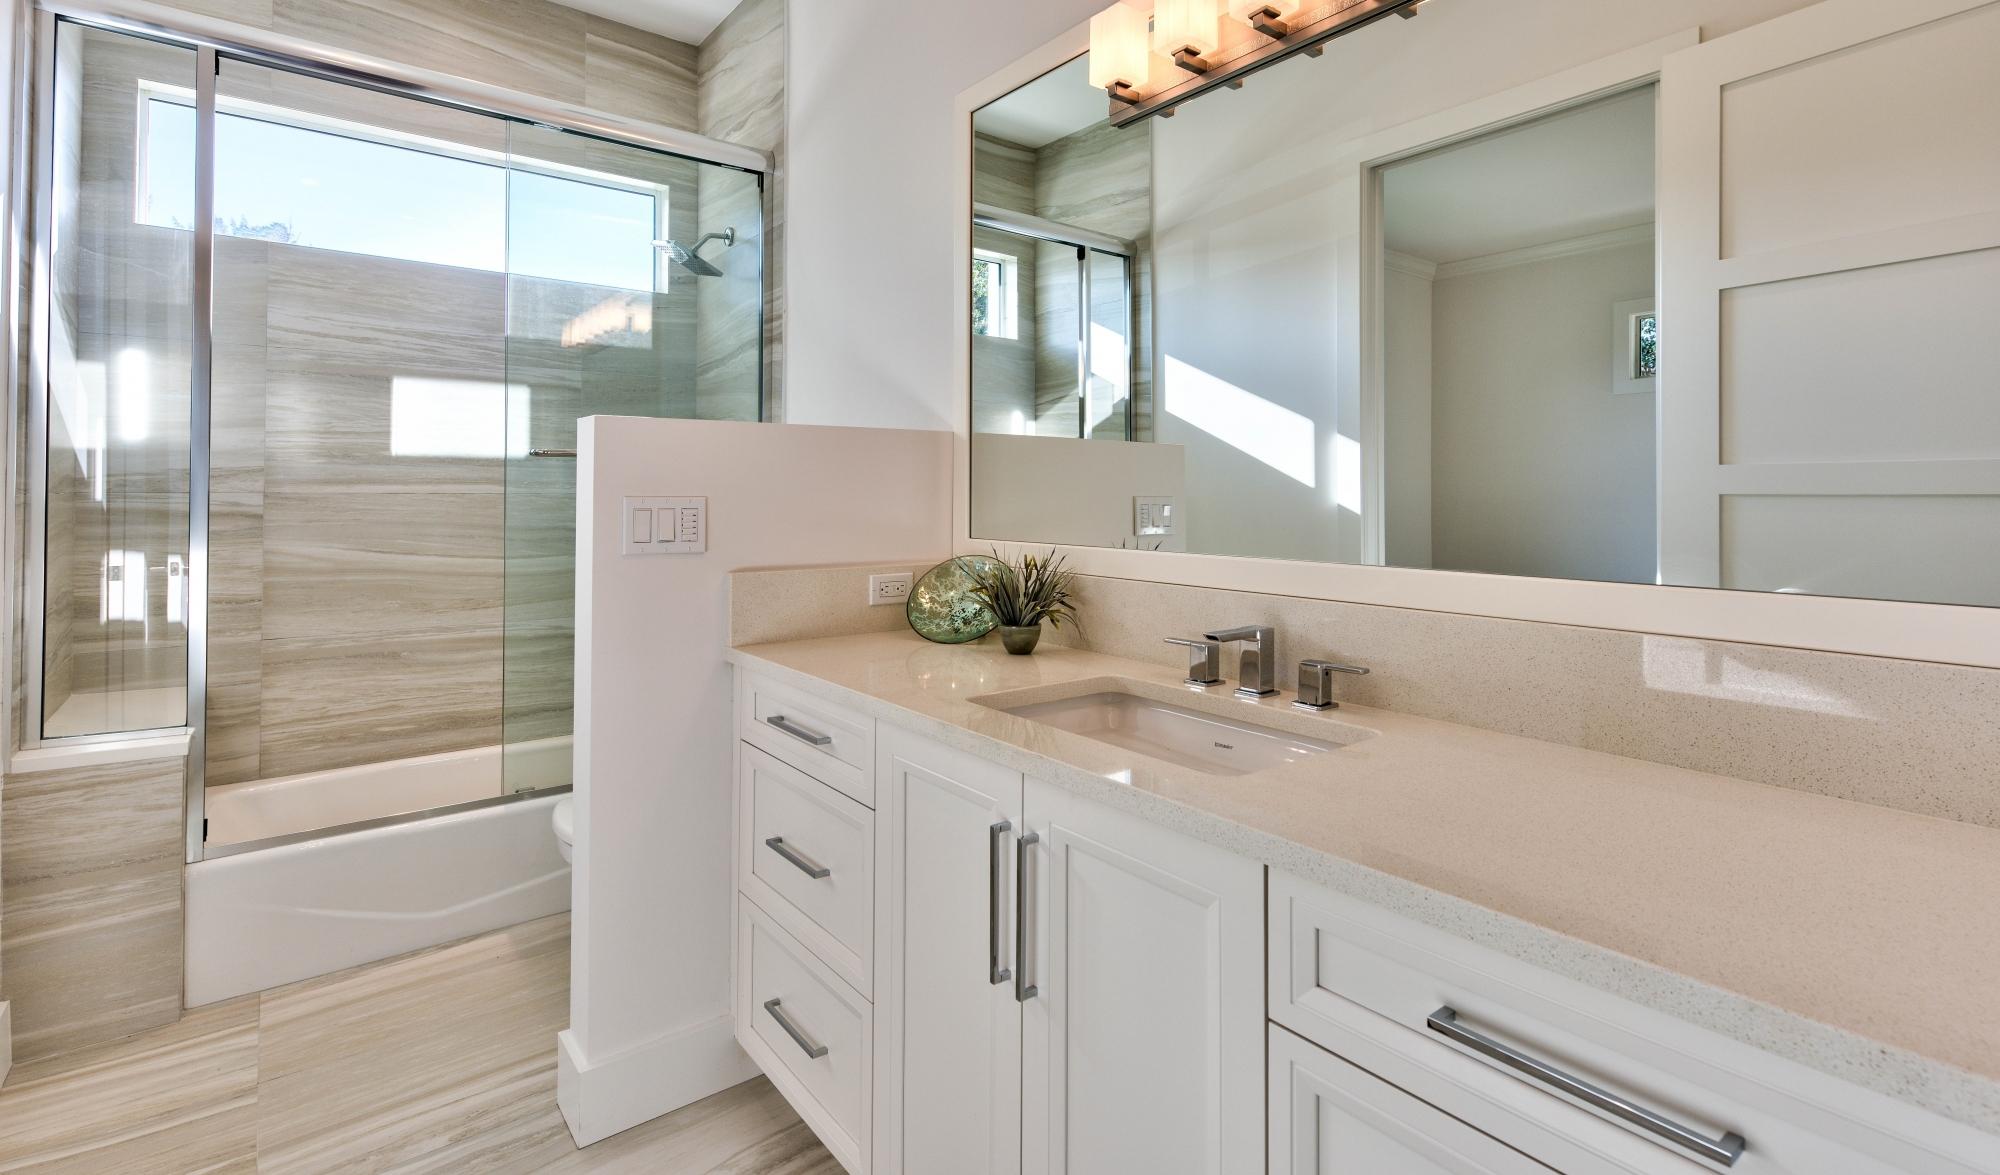 Premiere Showcase Bathroom Renovations Makeovers Contractor - Bathroom vanities bonita springs fl